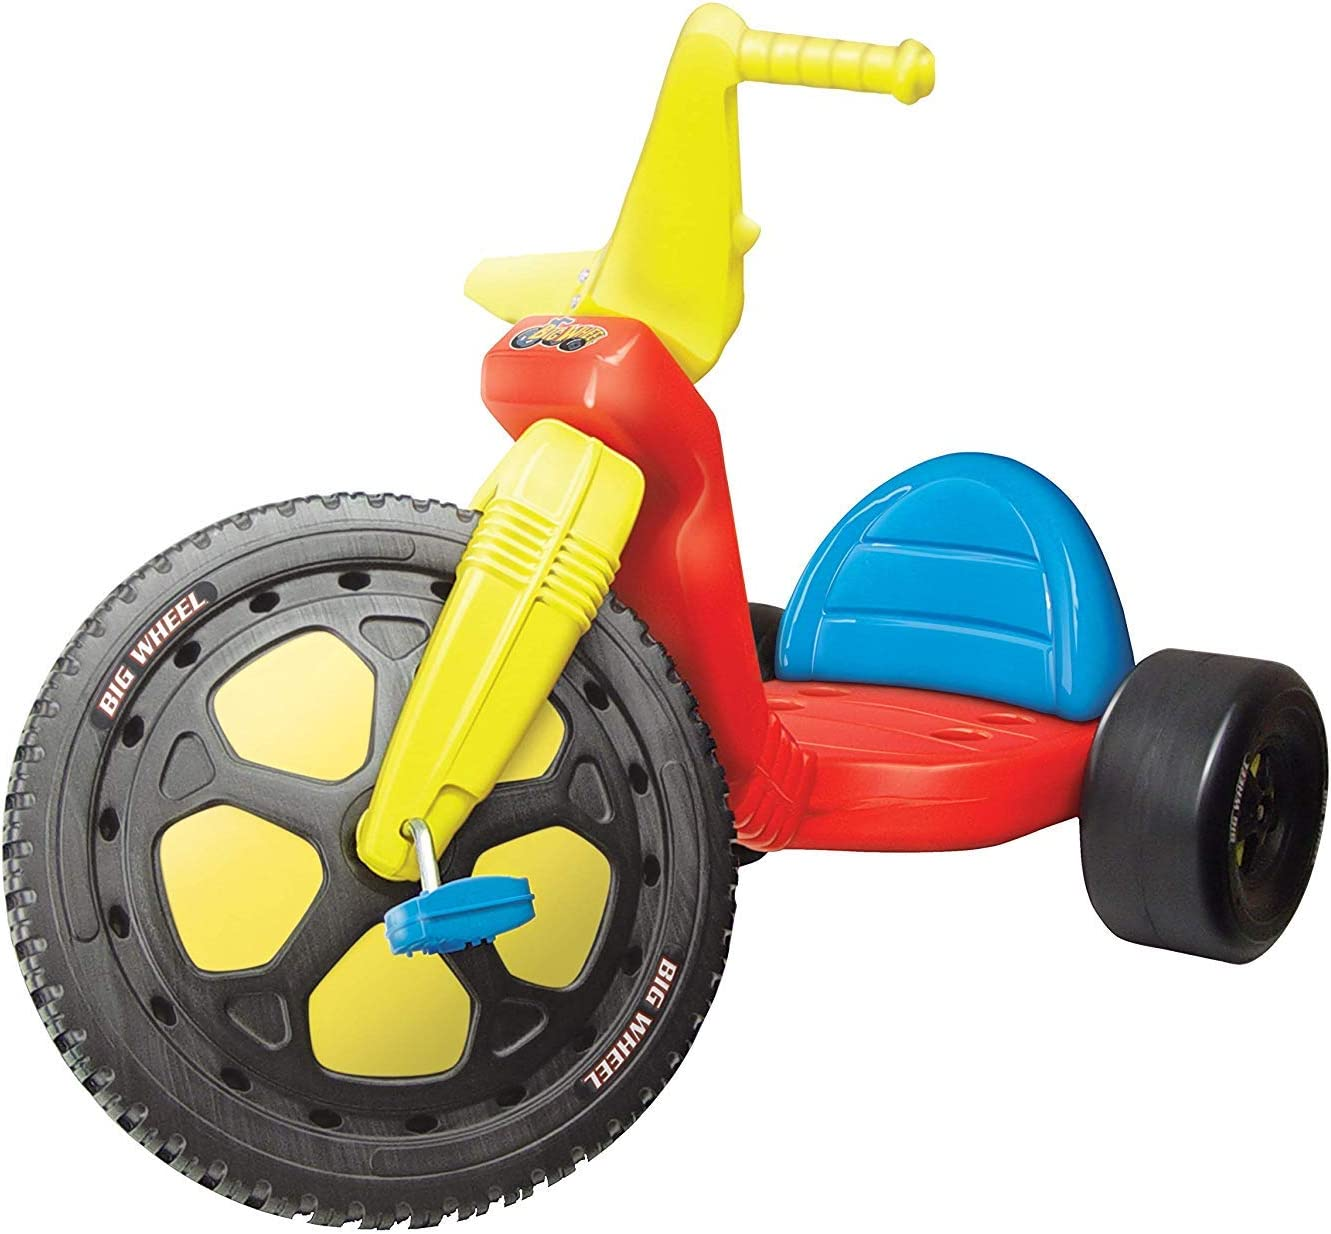 The Original Junior 11 Big Wheel Trike Original Big Wheel Tricycle for Kids 3-8